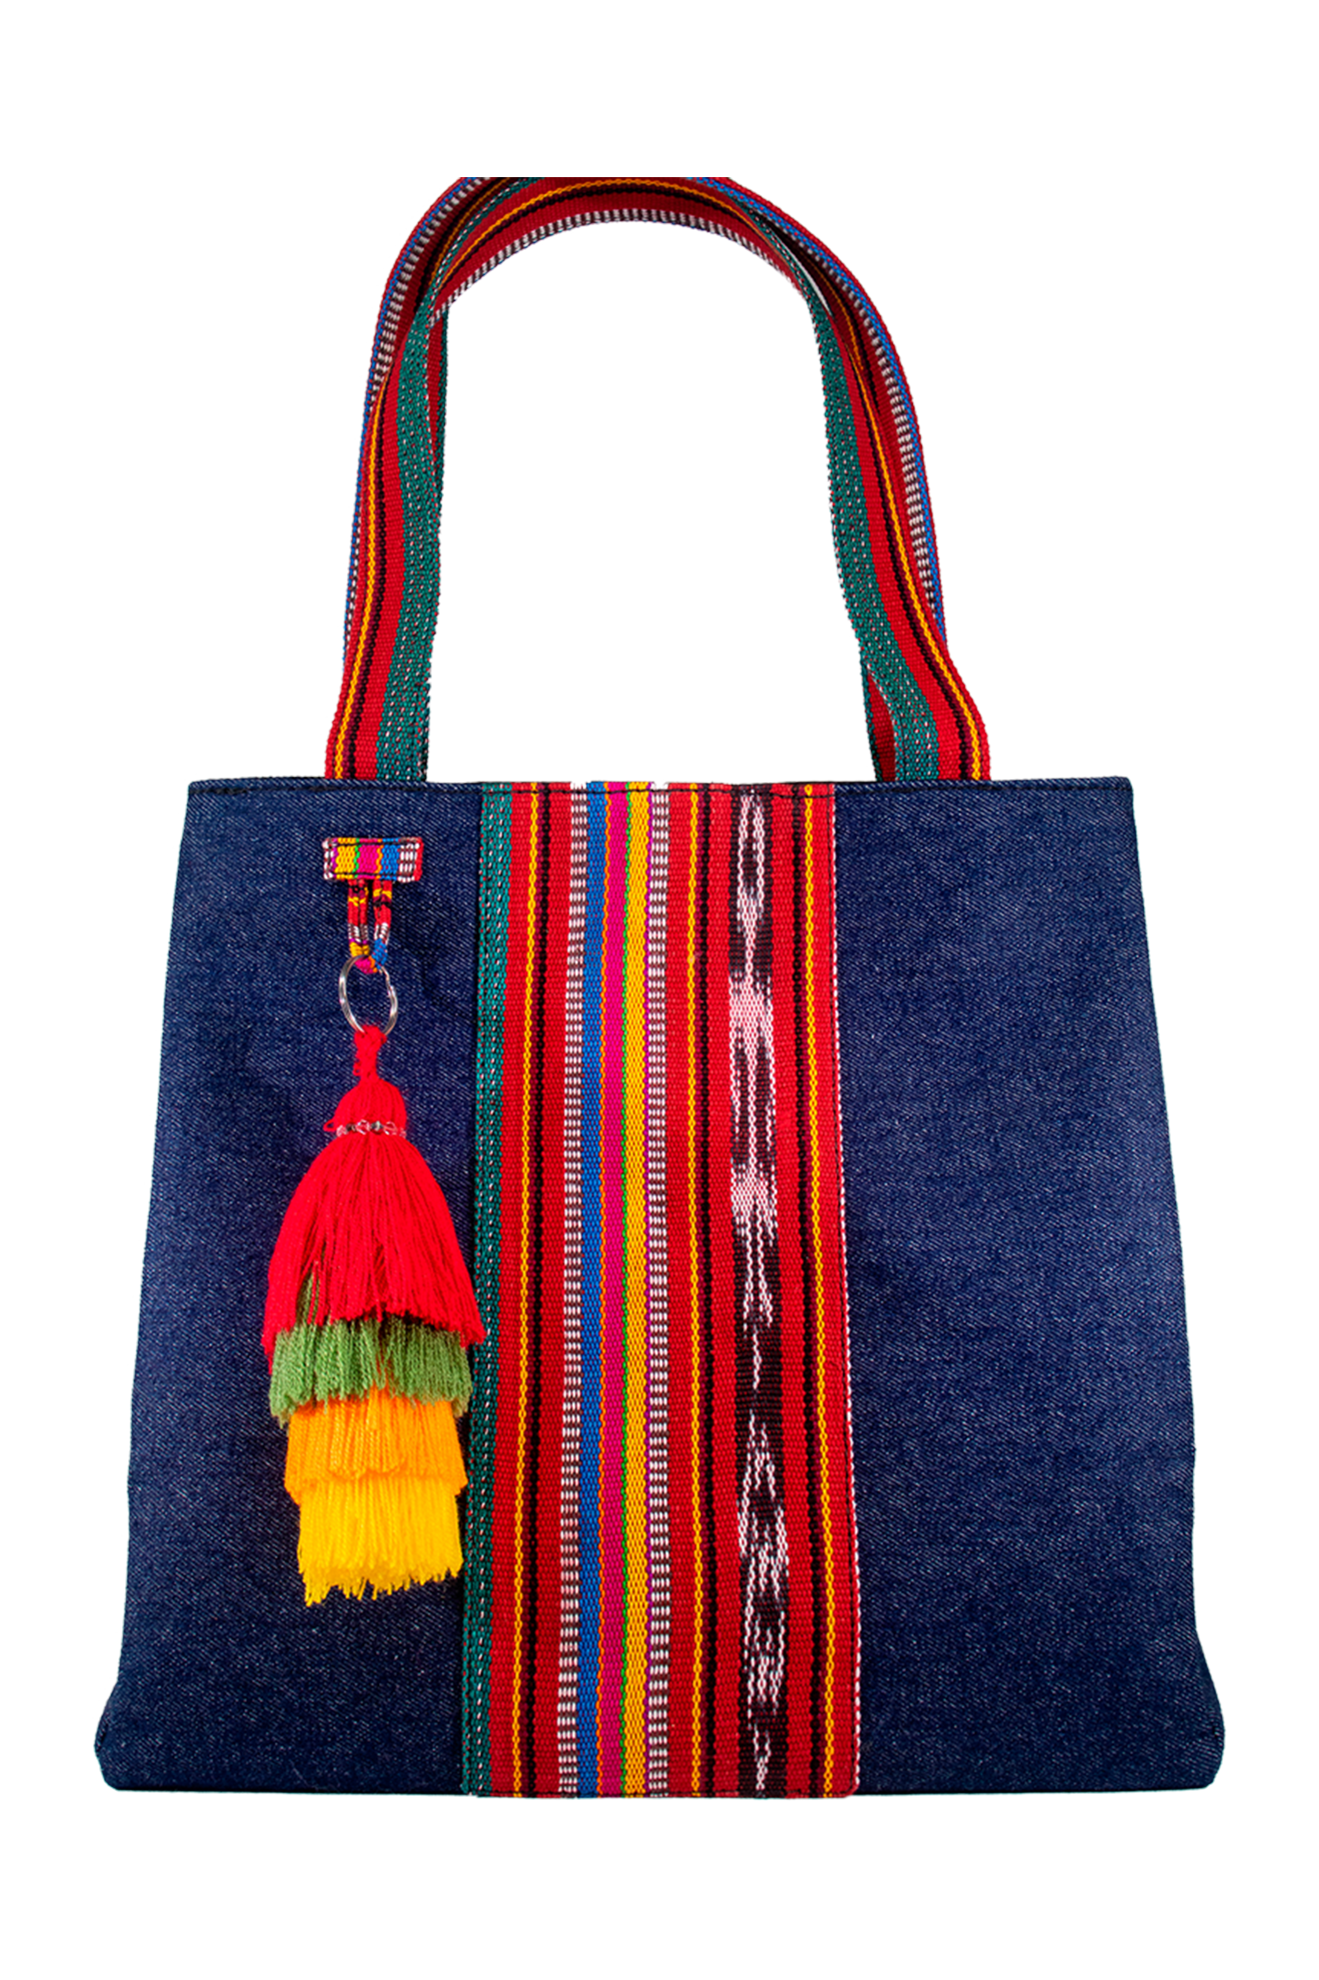 "Denim & Handwoven Textile Shoulder Bag ""Tivoli"""